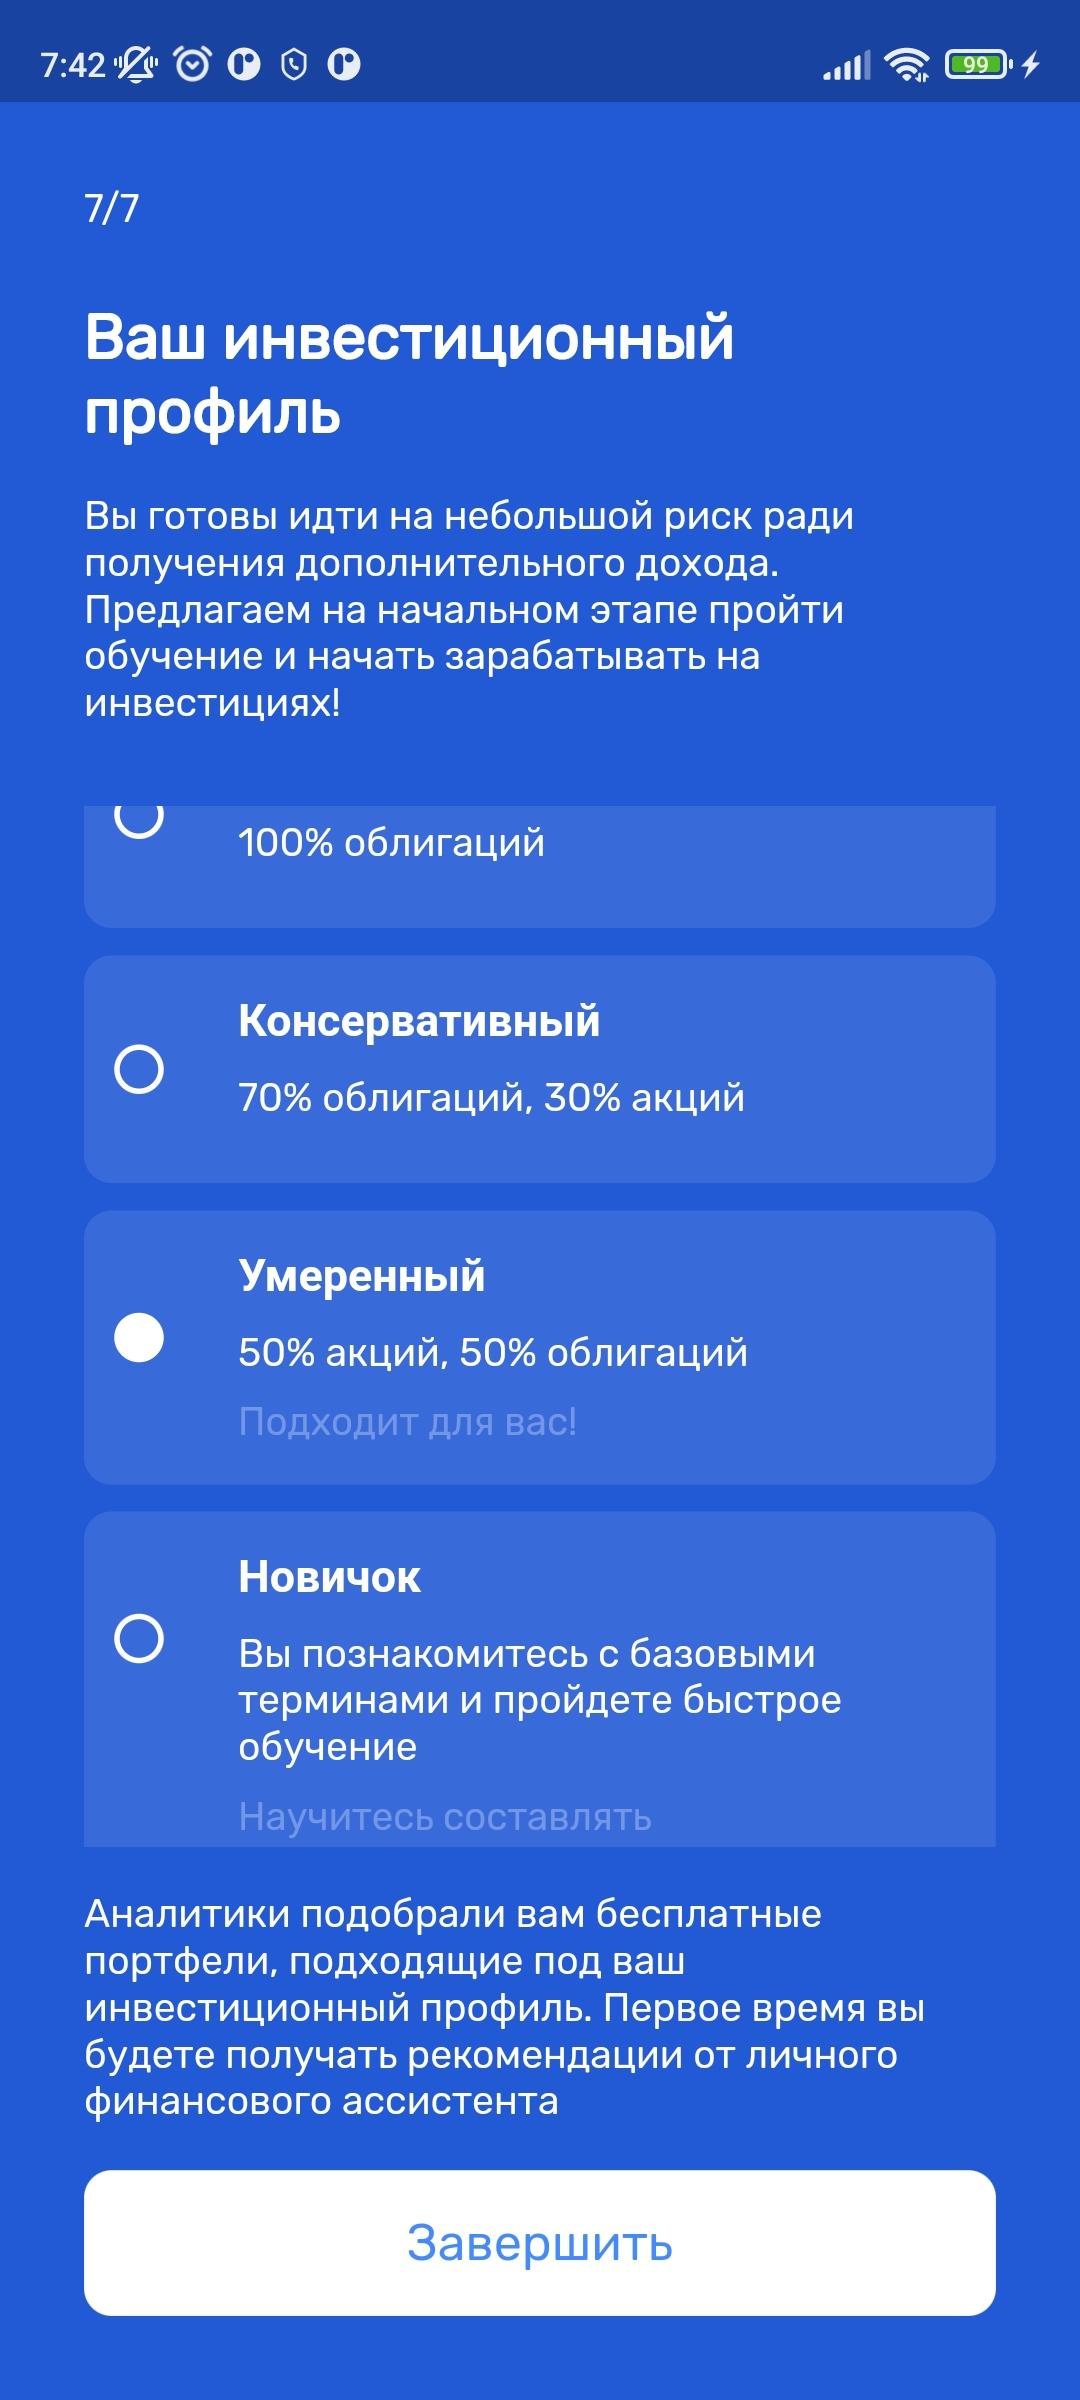 Flutter application for the online hackathon MORE.tech 3.0 from VTB